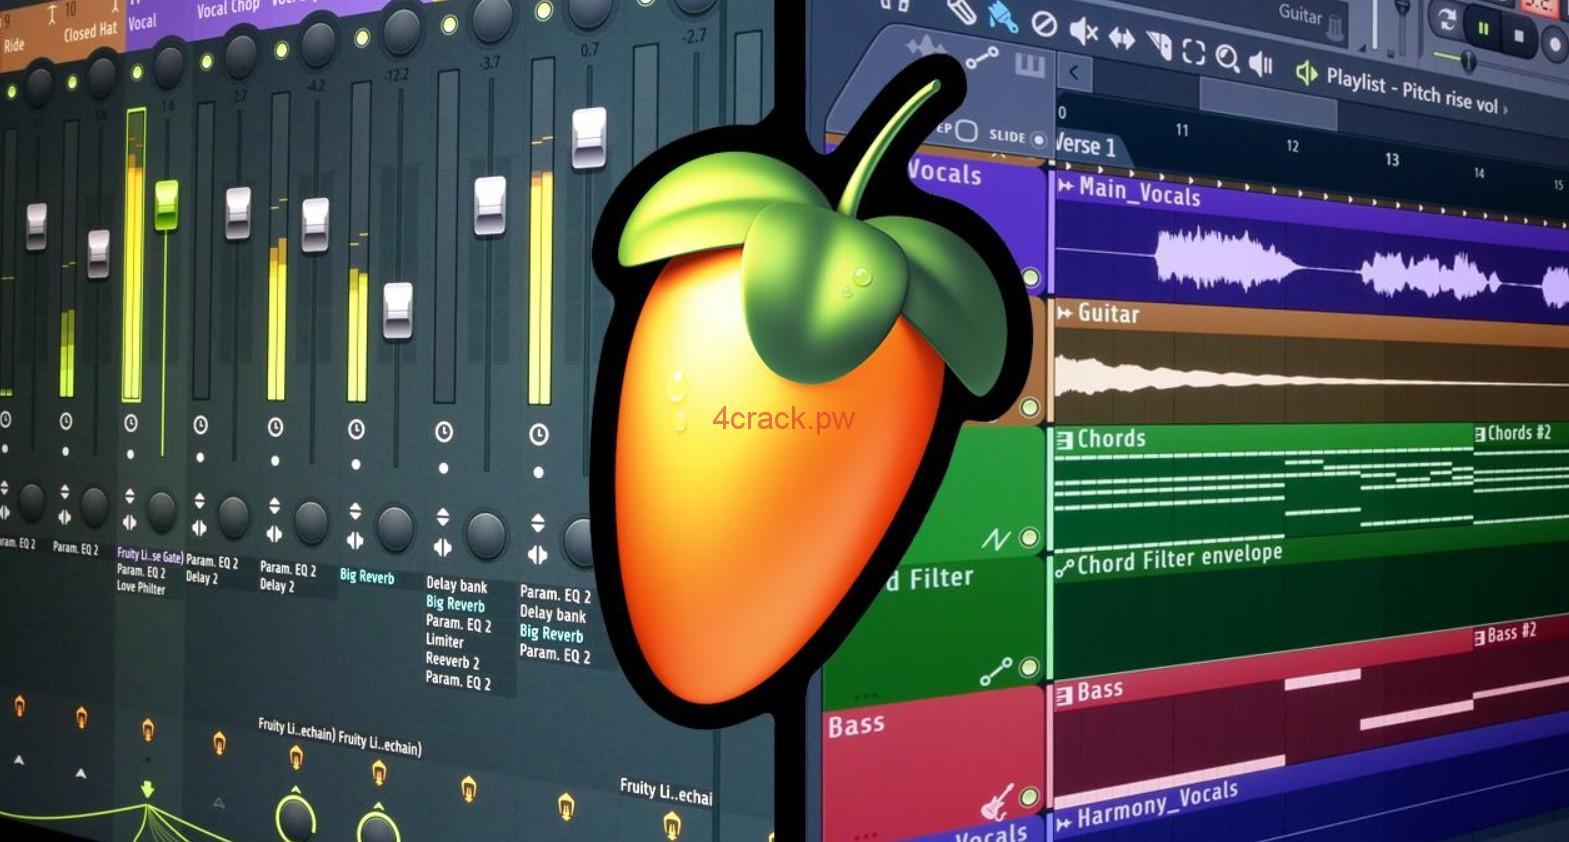 fl studio 20 keygen only download